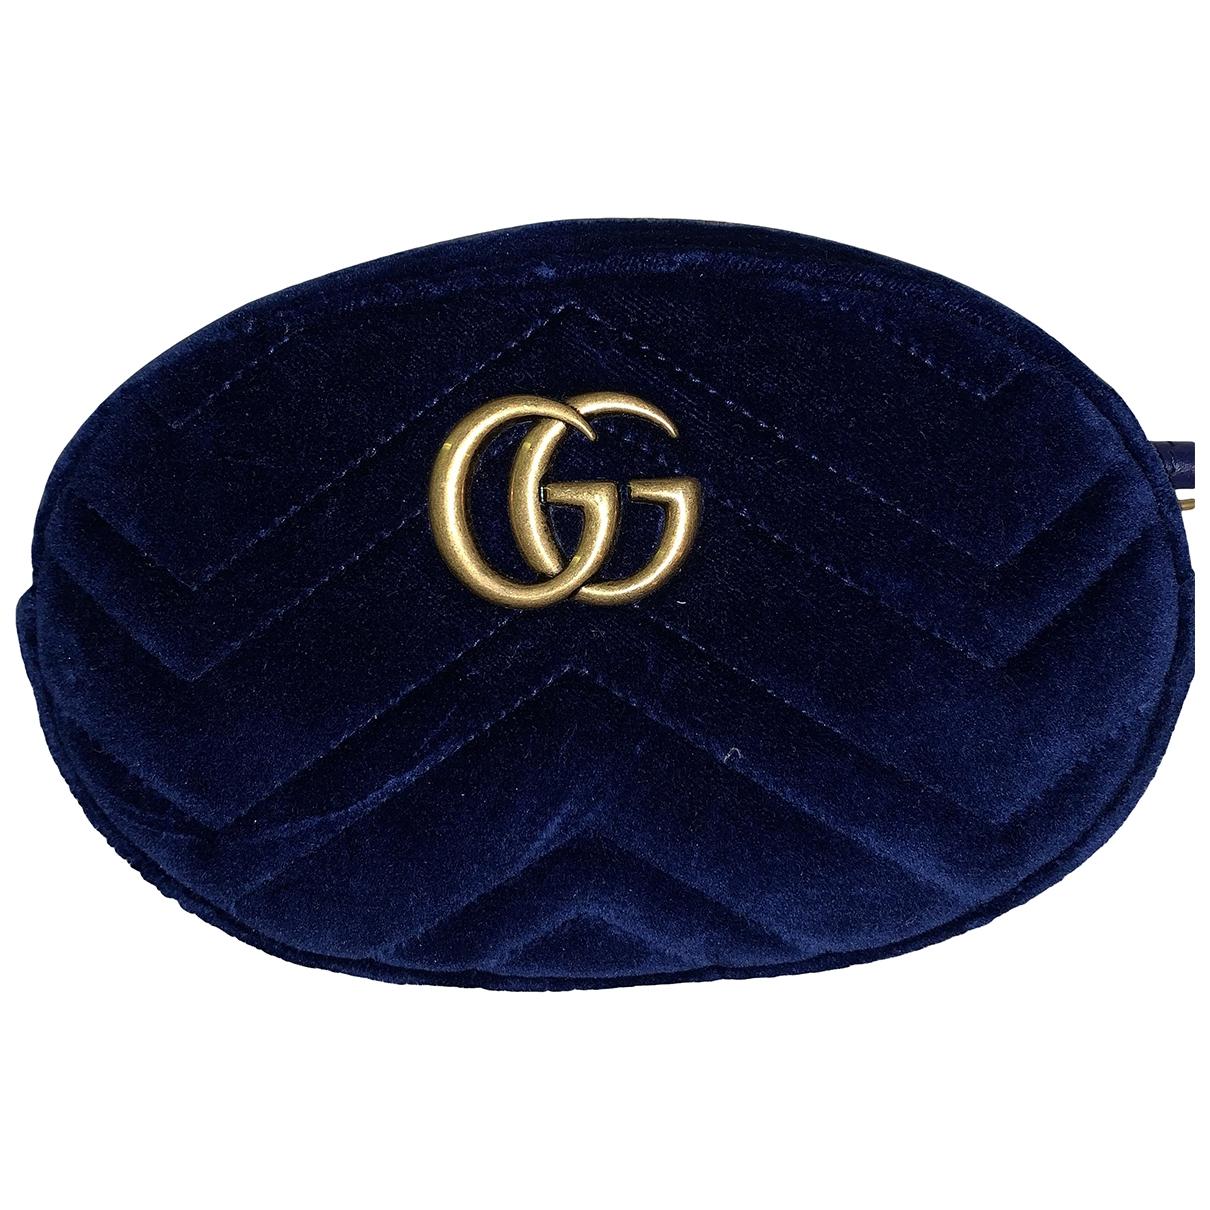 Gucci Marmont Navy Velvet Clutch bag for Women N